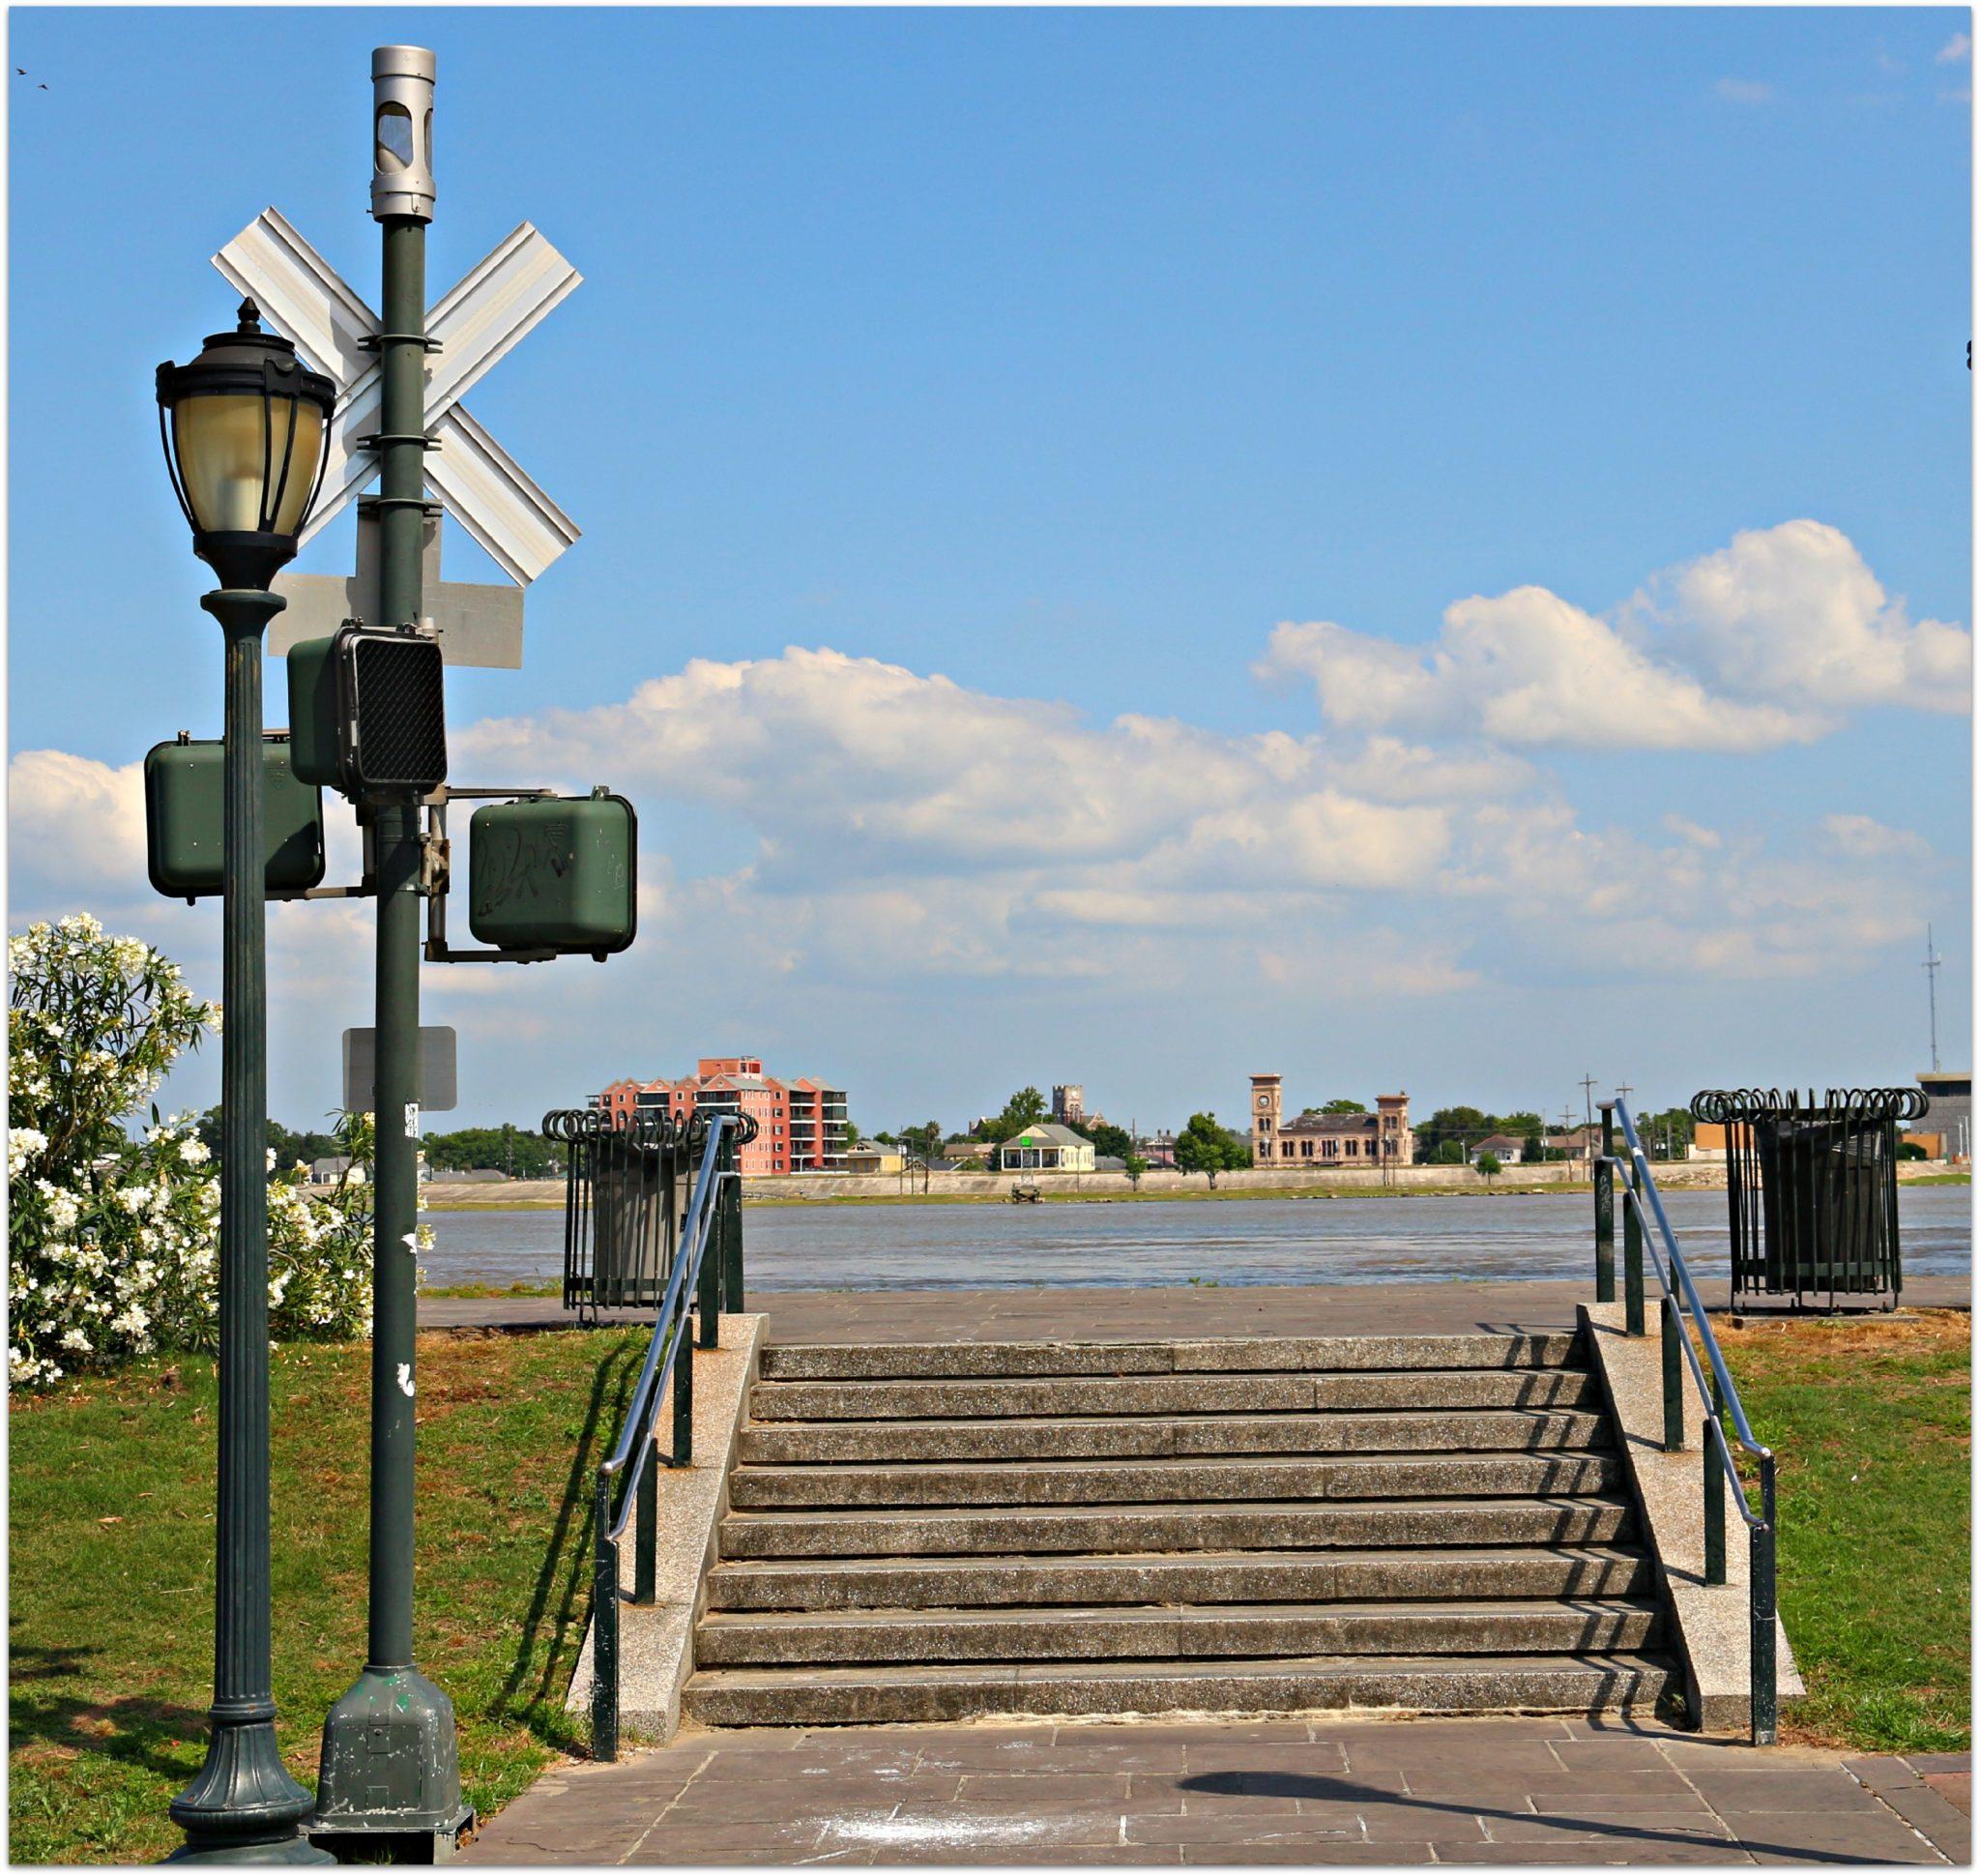 Walk along the Mississippi River